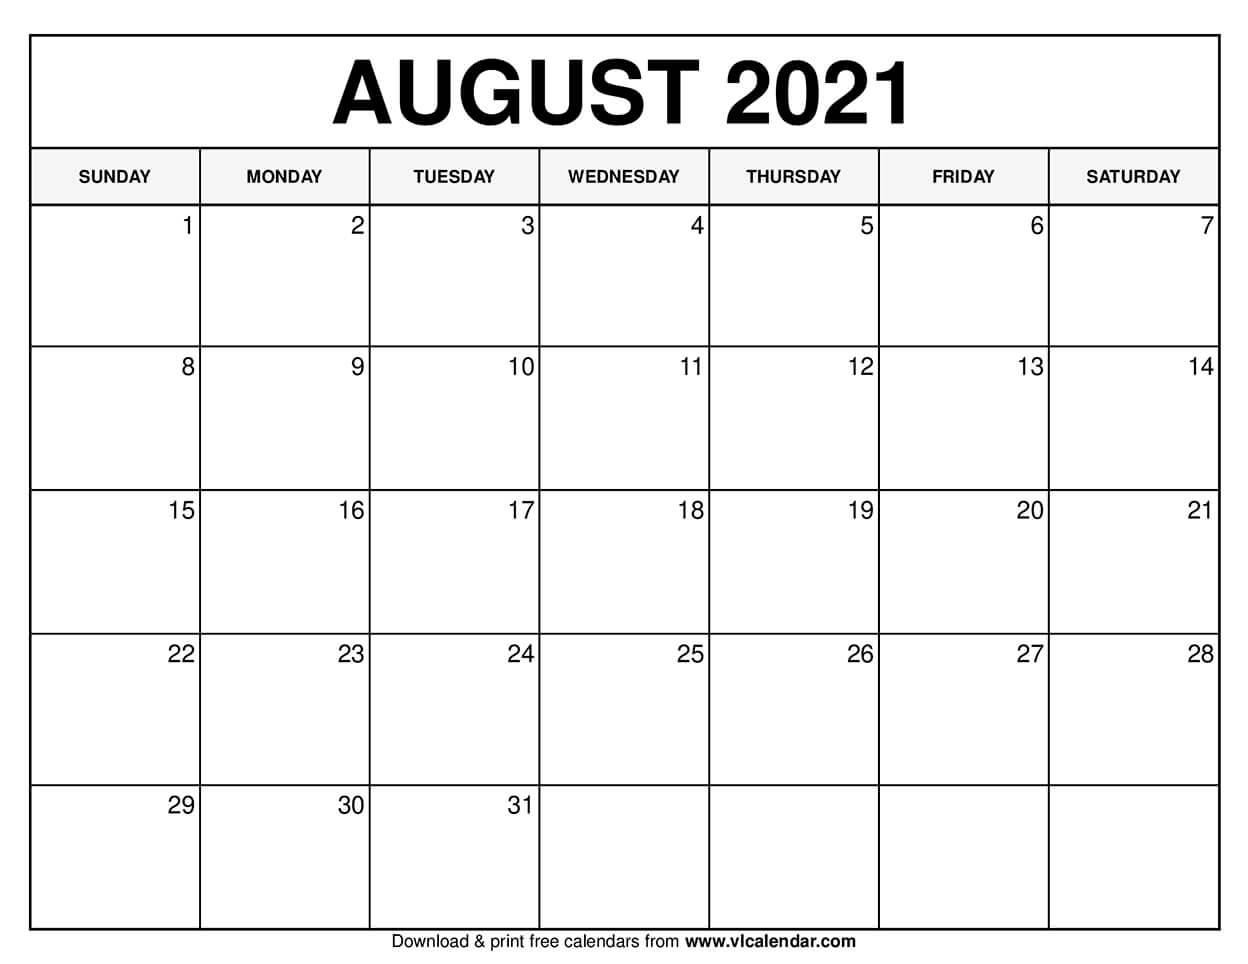 Catch Printable Calendar August 2021